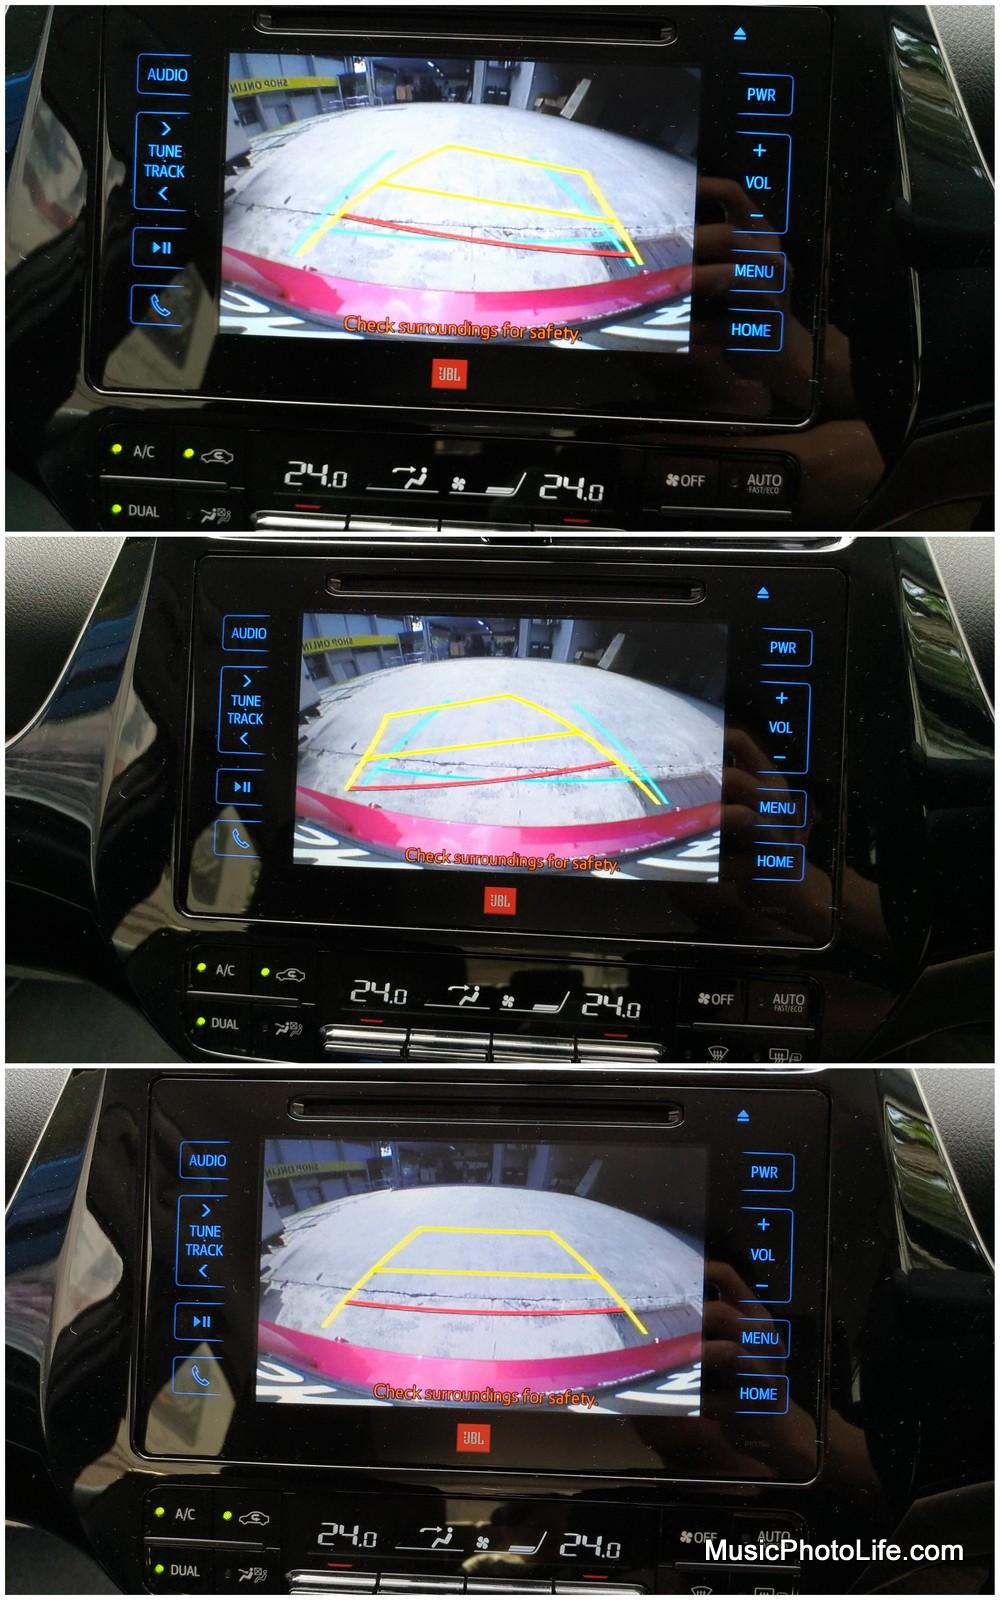 Toyota Prius 2016 reverse camera dynamic guideline